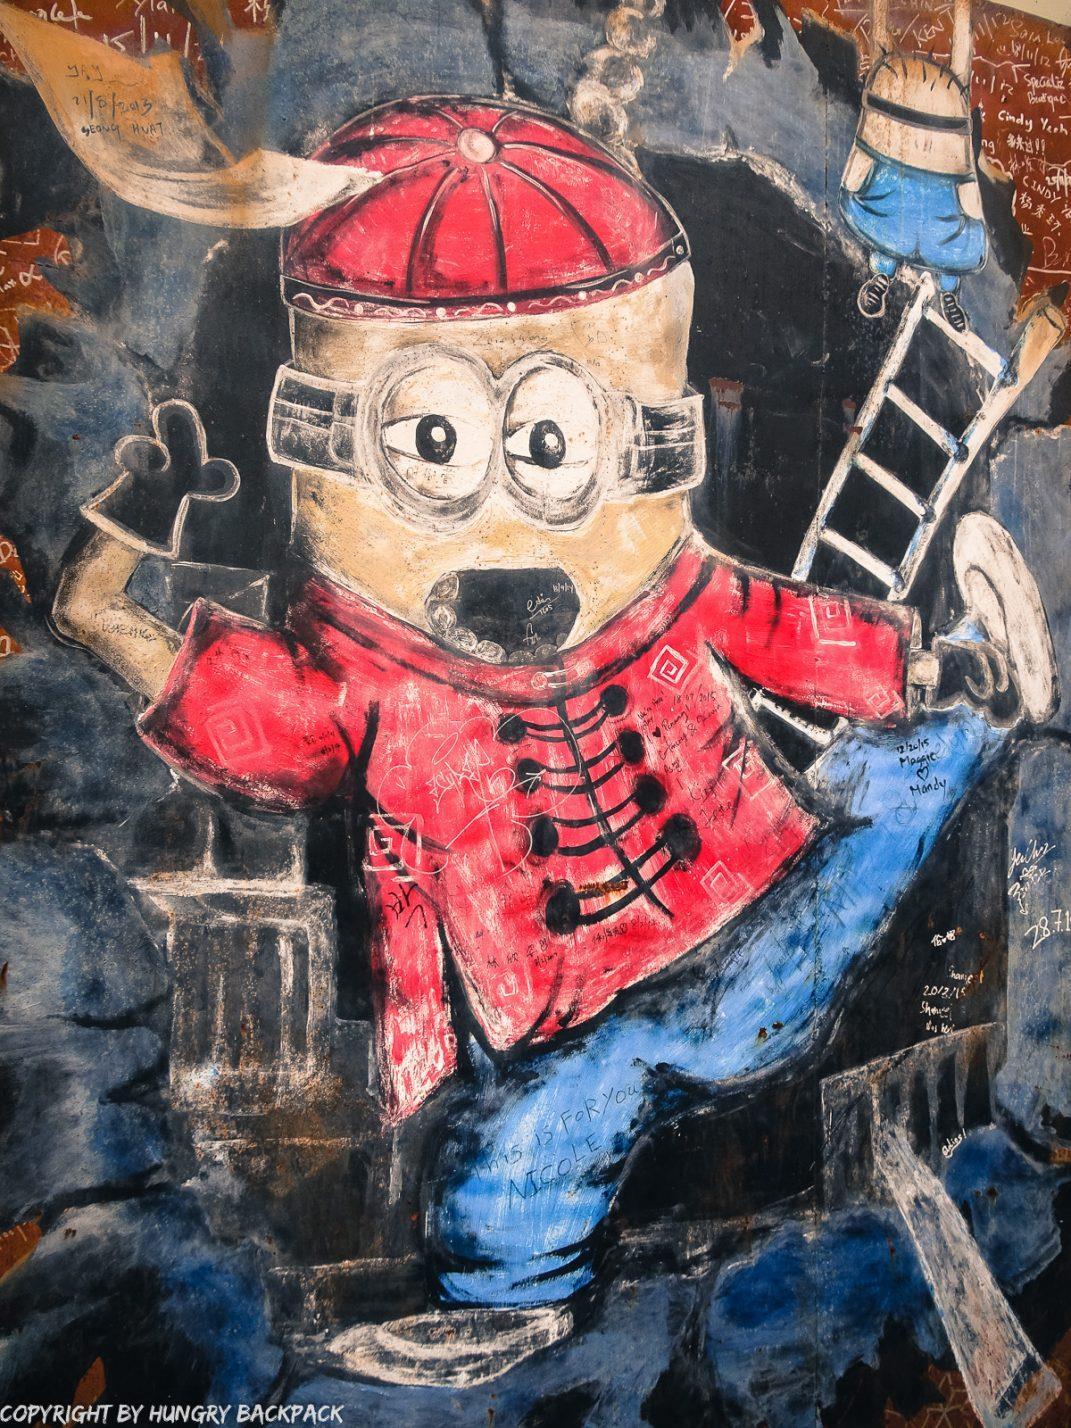 minion fireman street art mural Penang